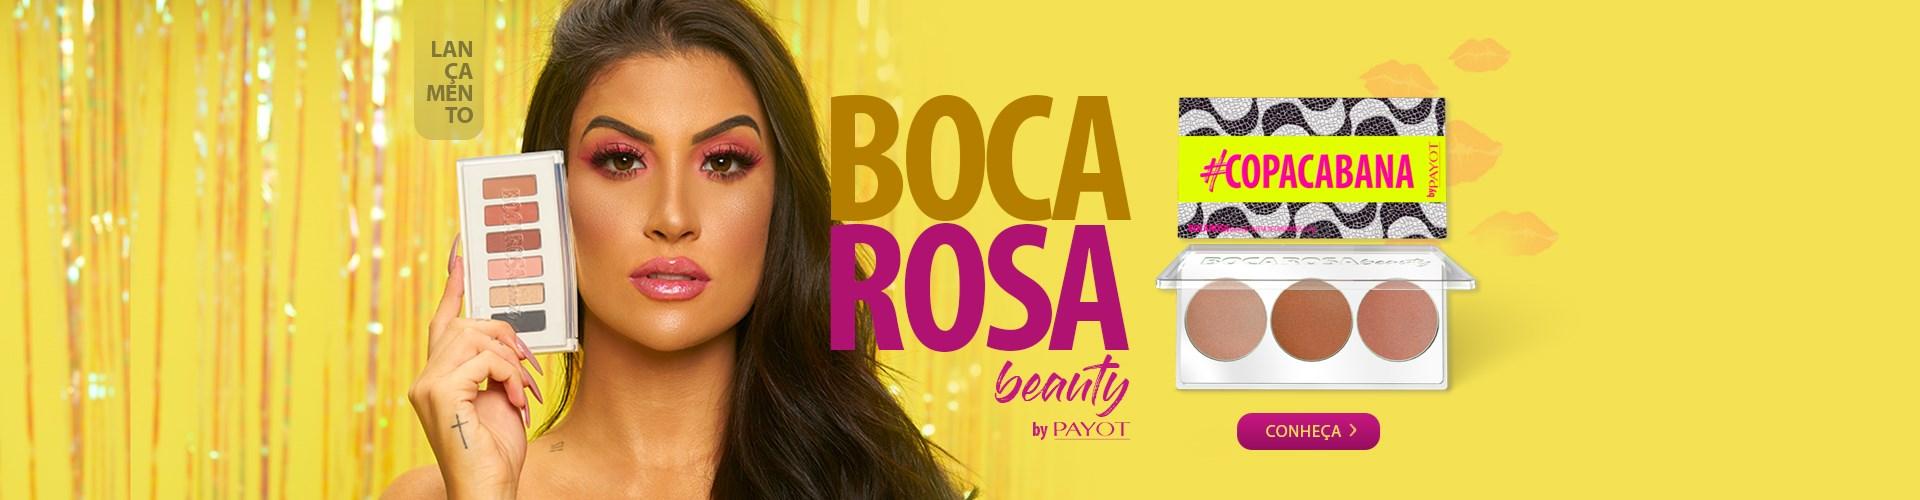 Paletas Boca Rosa